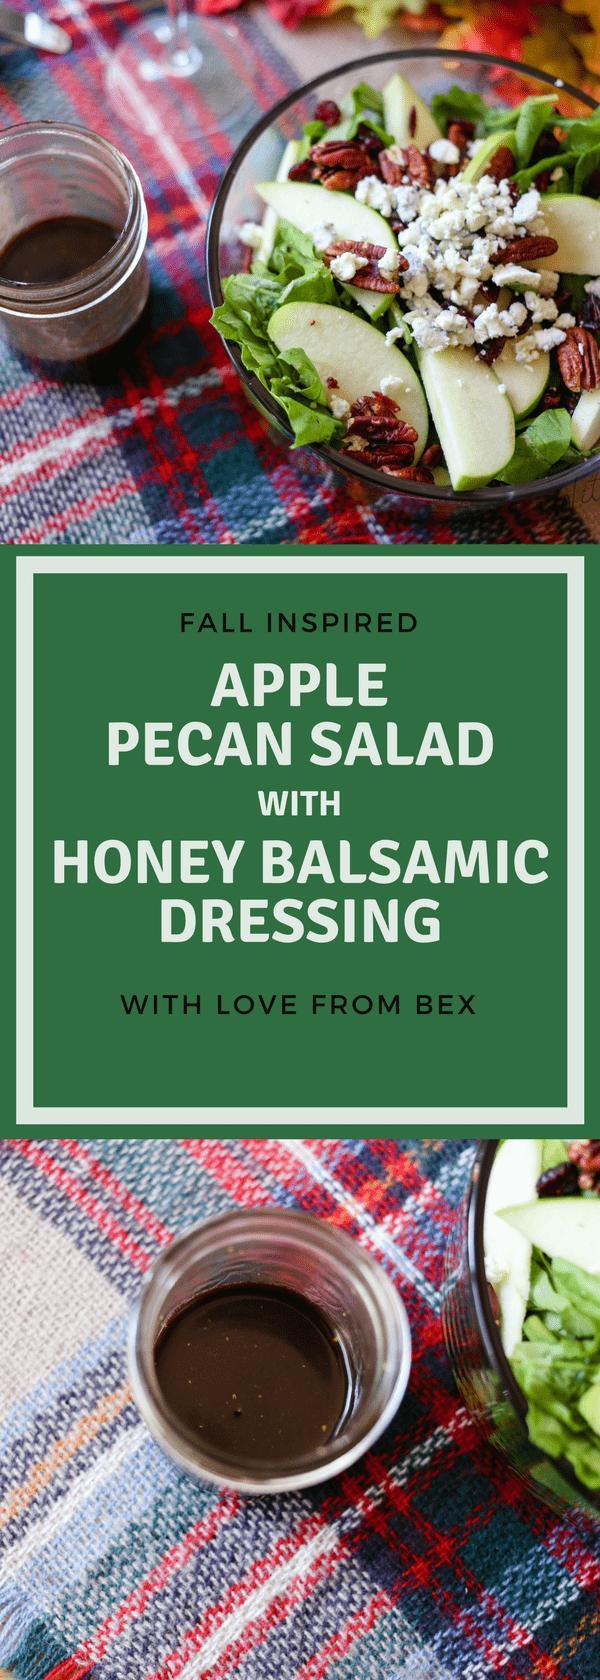 Apple Pecan Salad with Honey Balsamic dressing